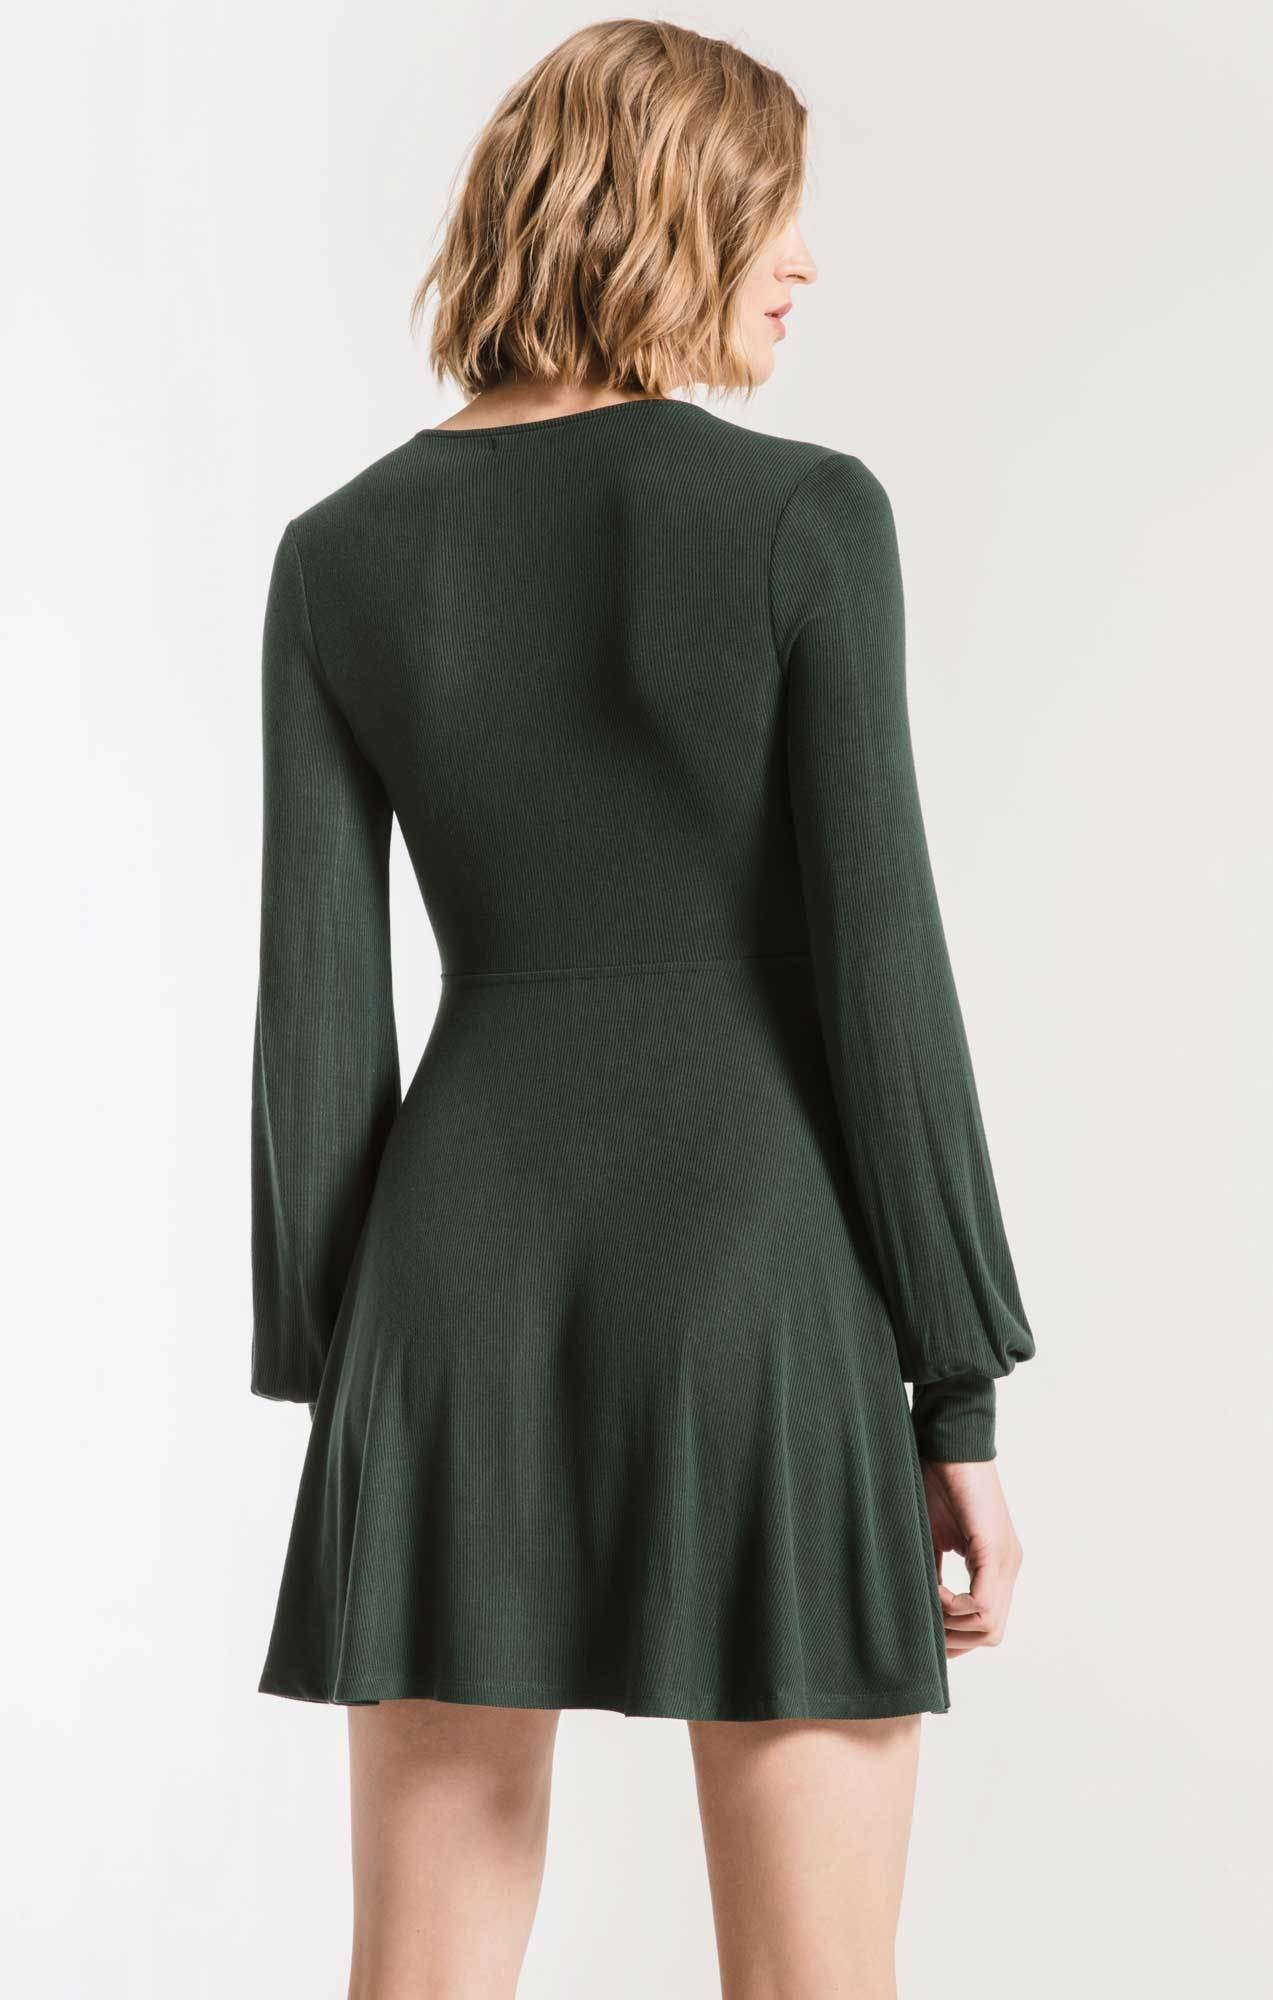 Z Supply The Micro Rib Dress